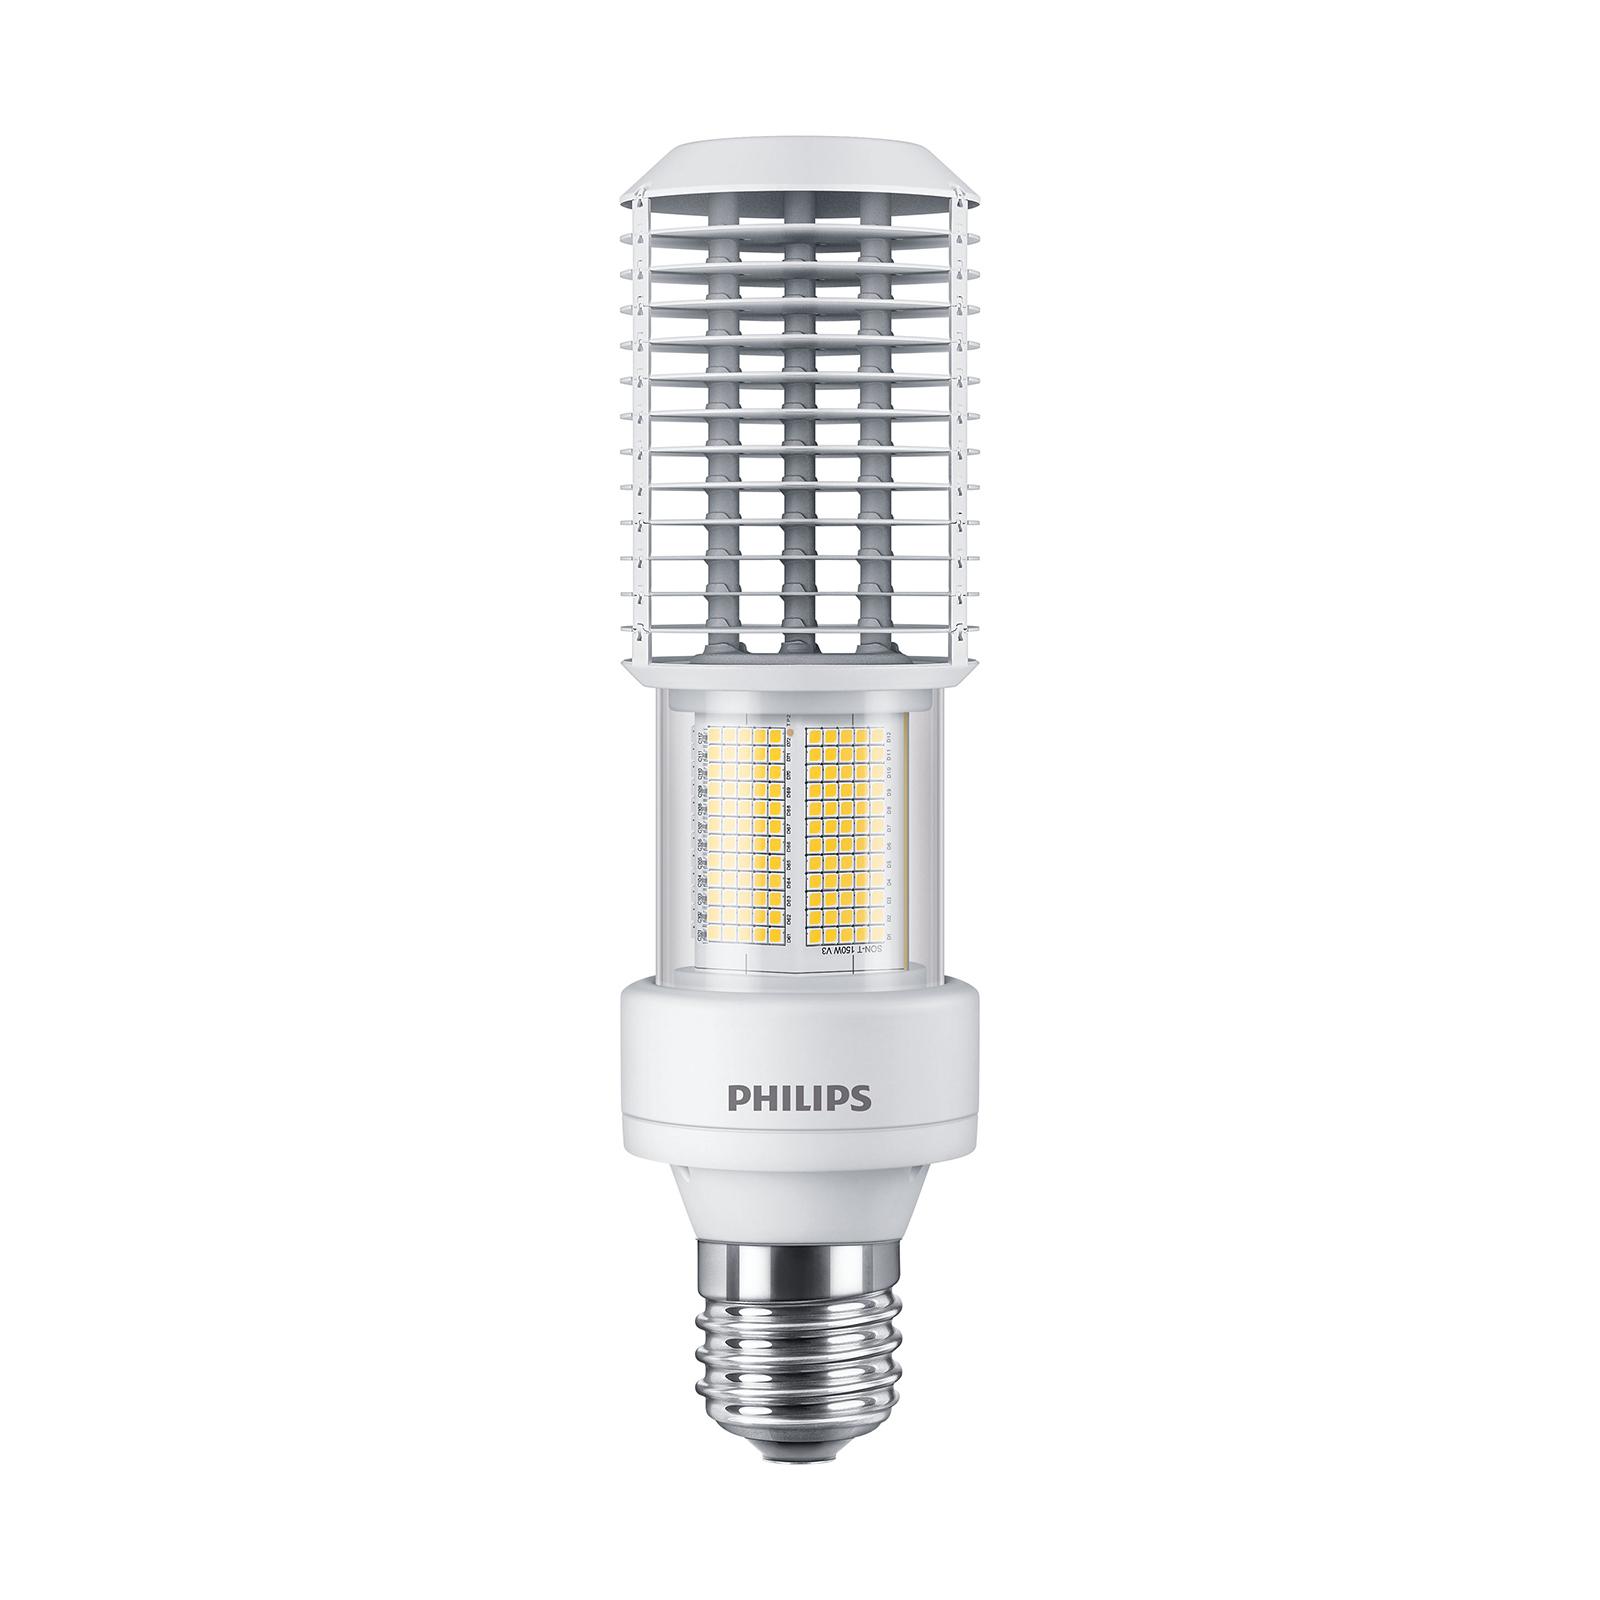 Philips E40 LED-pære TrueForce Road 120 68W 740